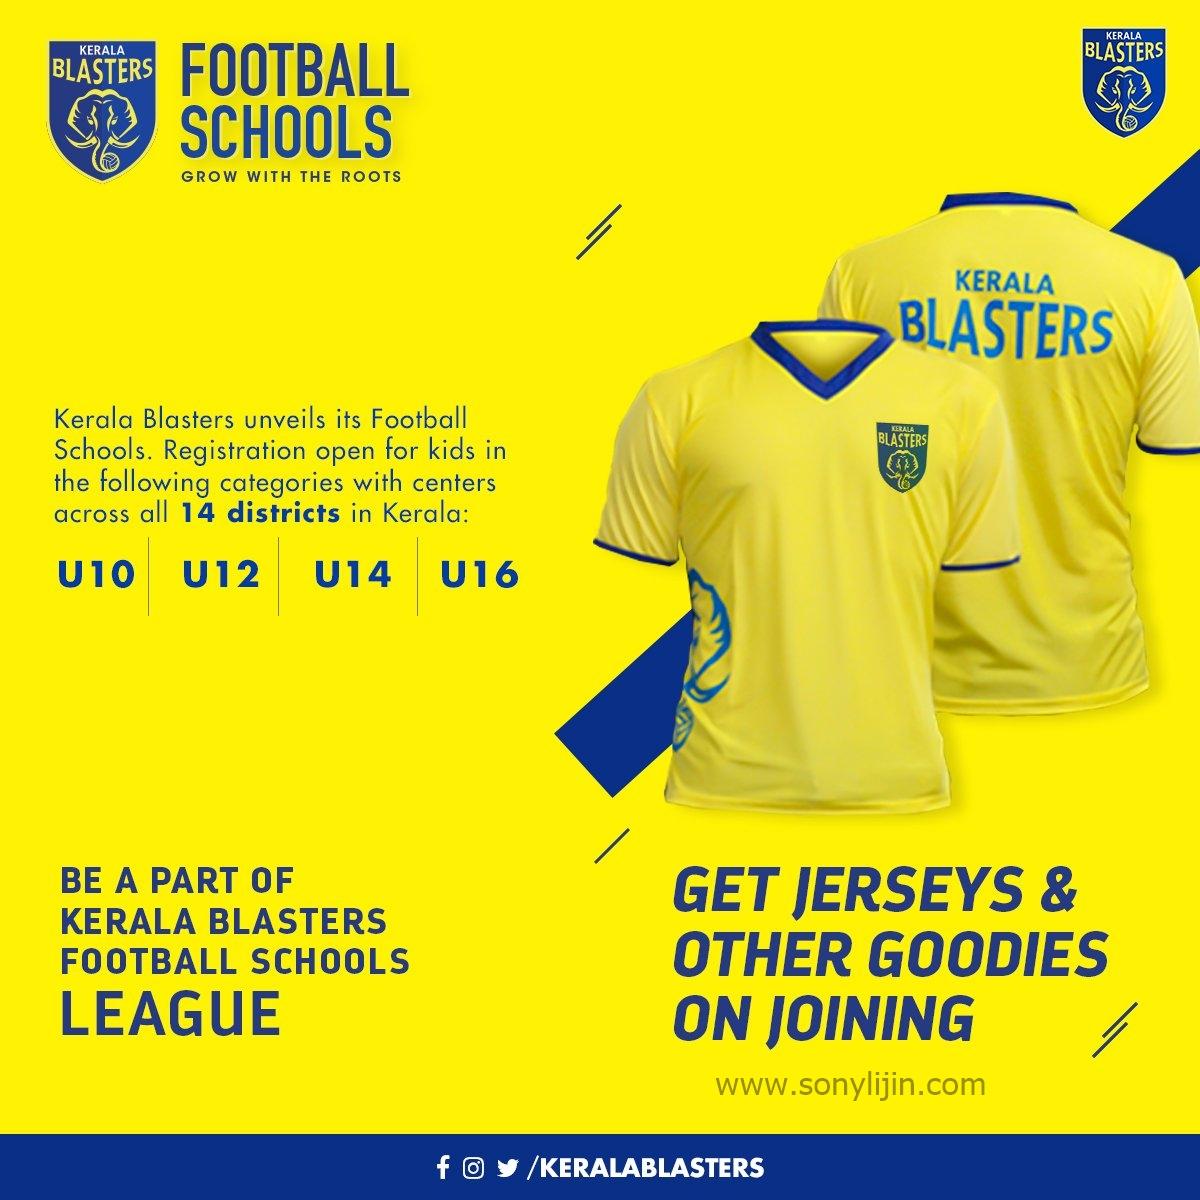 Kerala Blasters Football schools online registration form